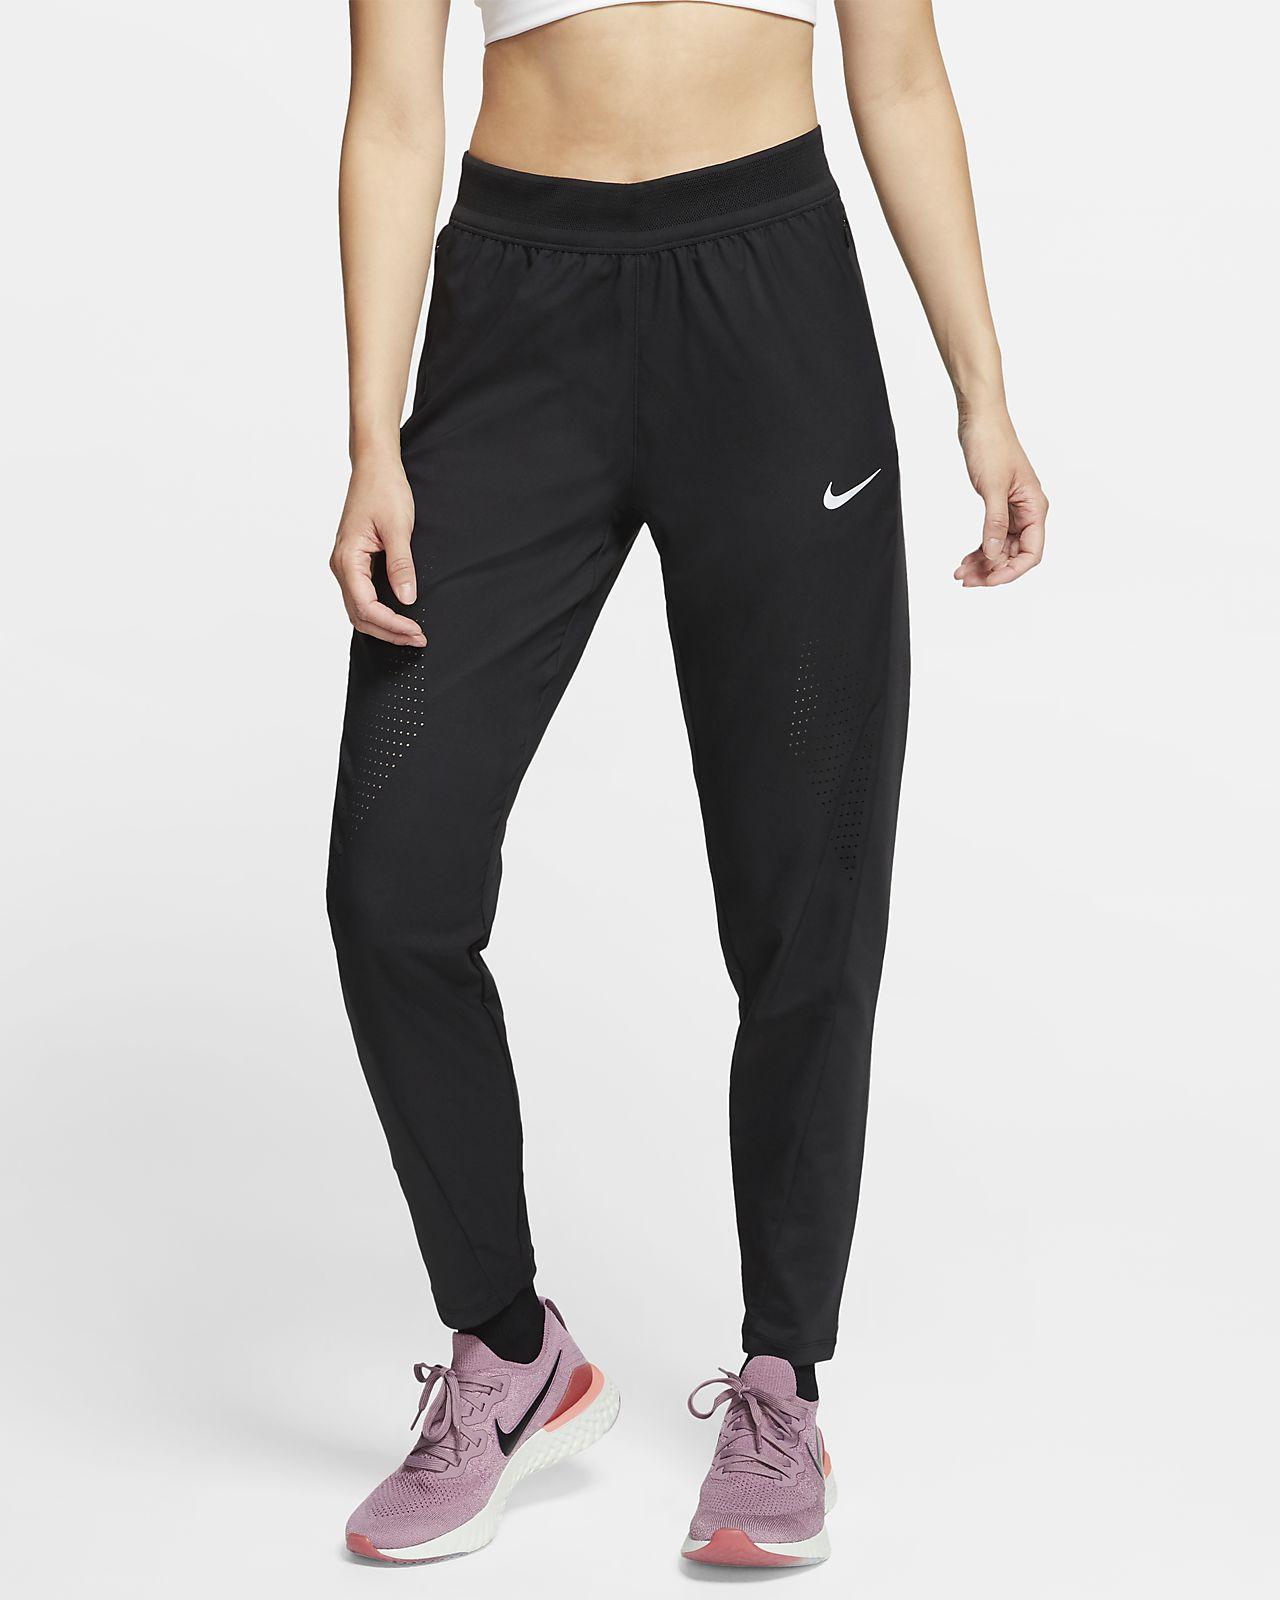 Pantalon de running Nike Swift pour Femme